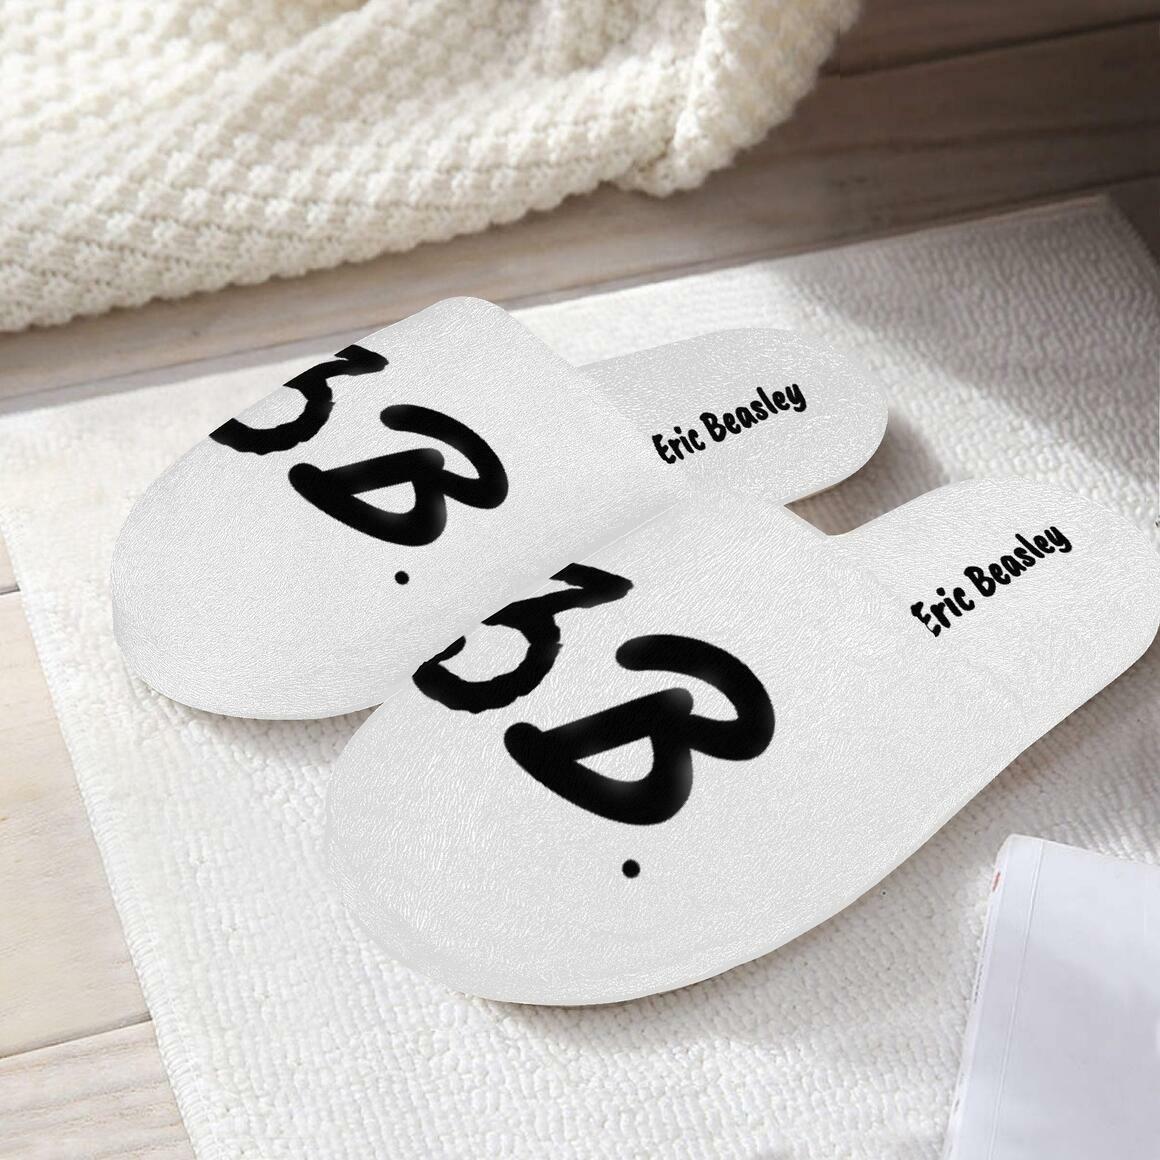 Men 3B Original Slippers - White | Trada Marketplace